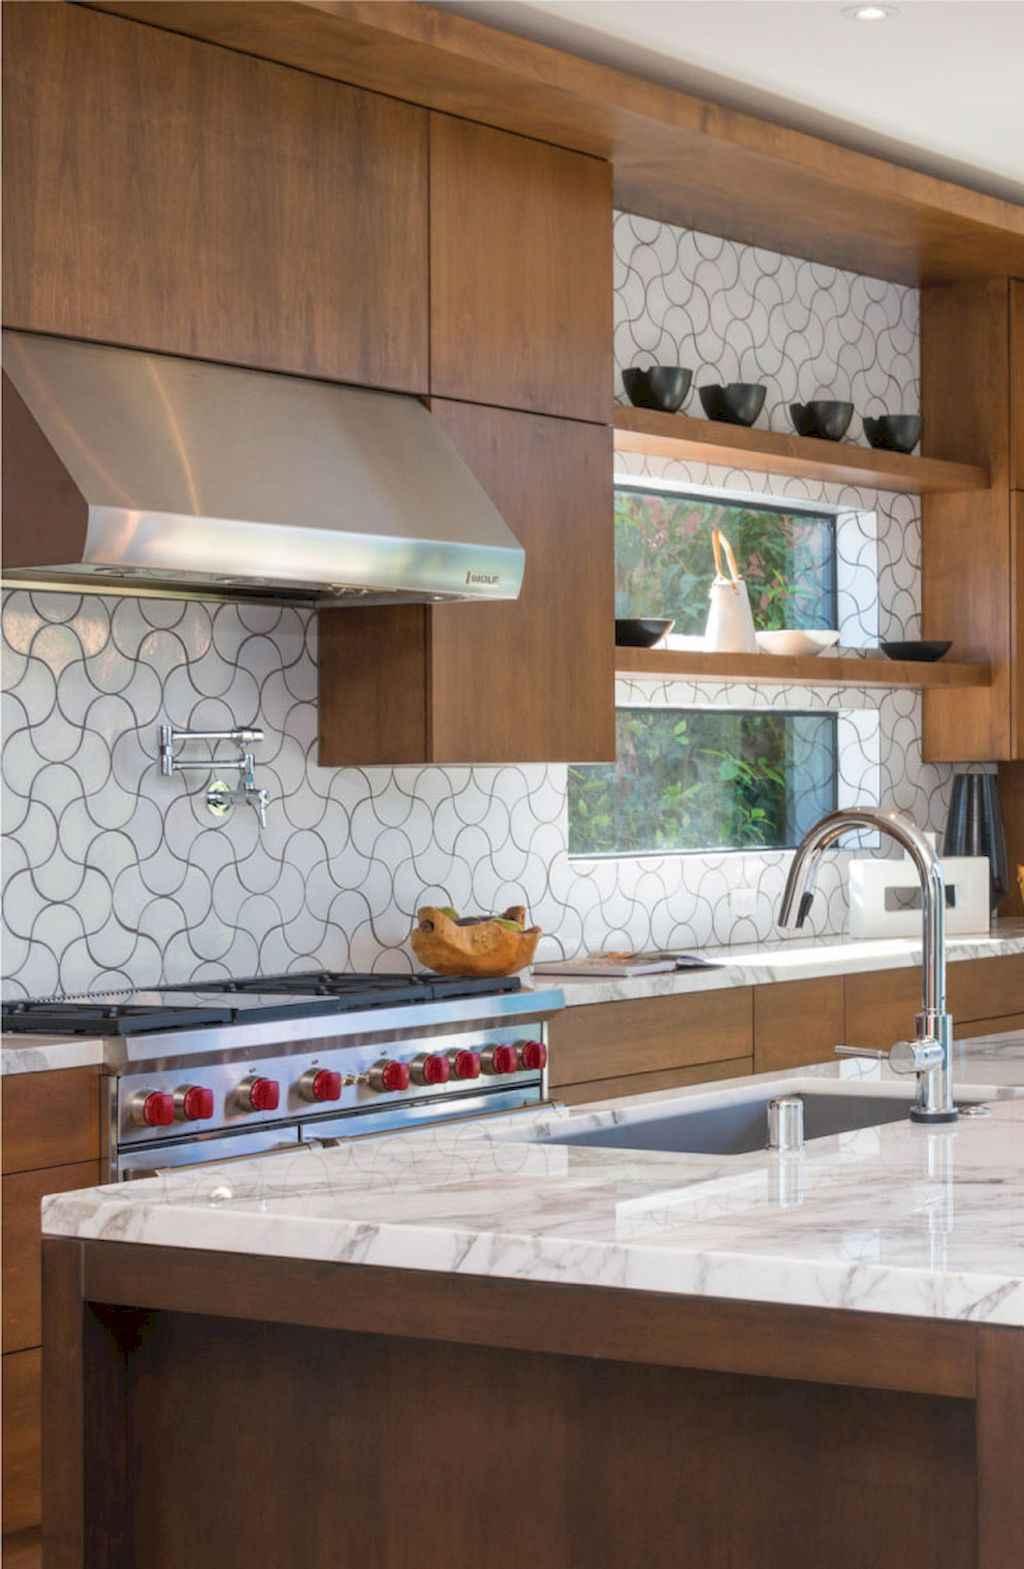 Mid century modern kitchen design ideas (30)